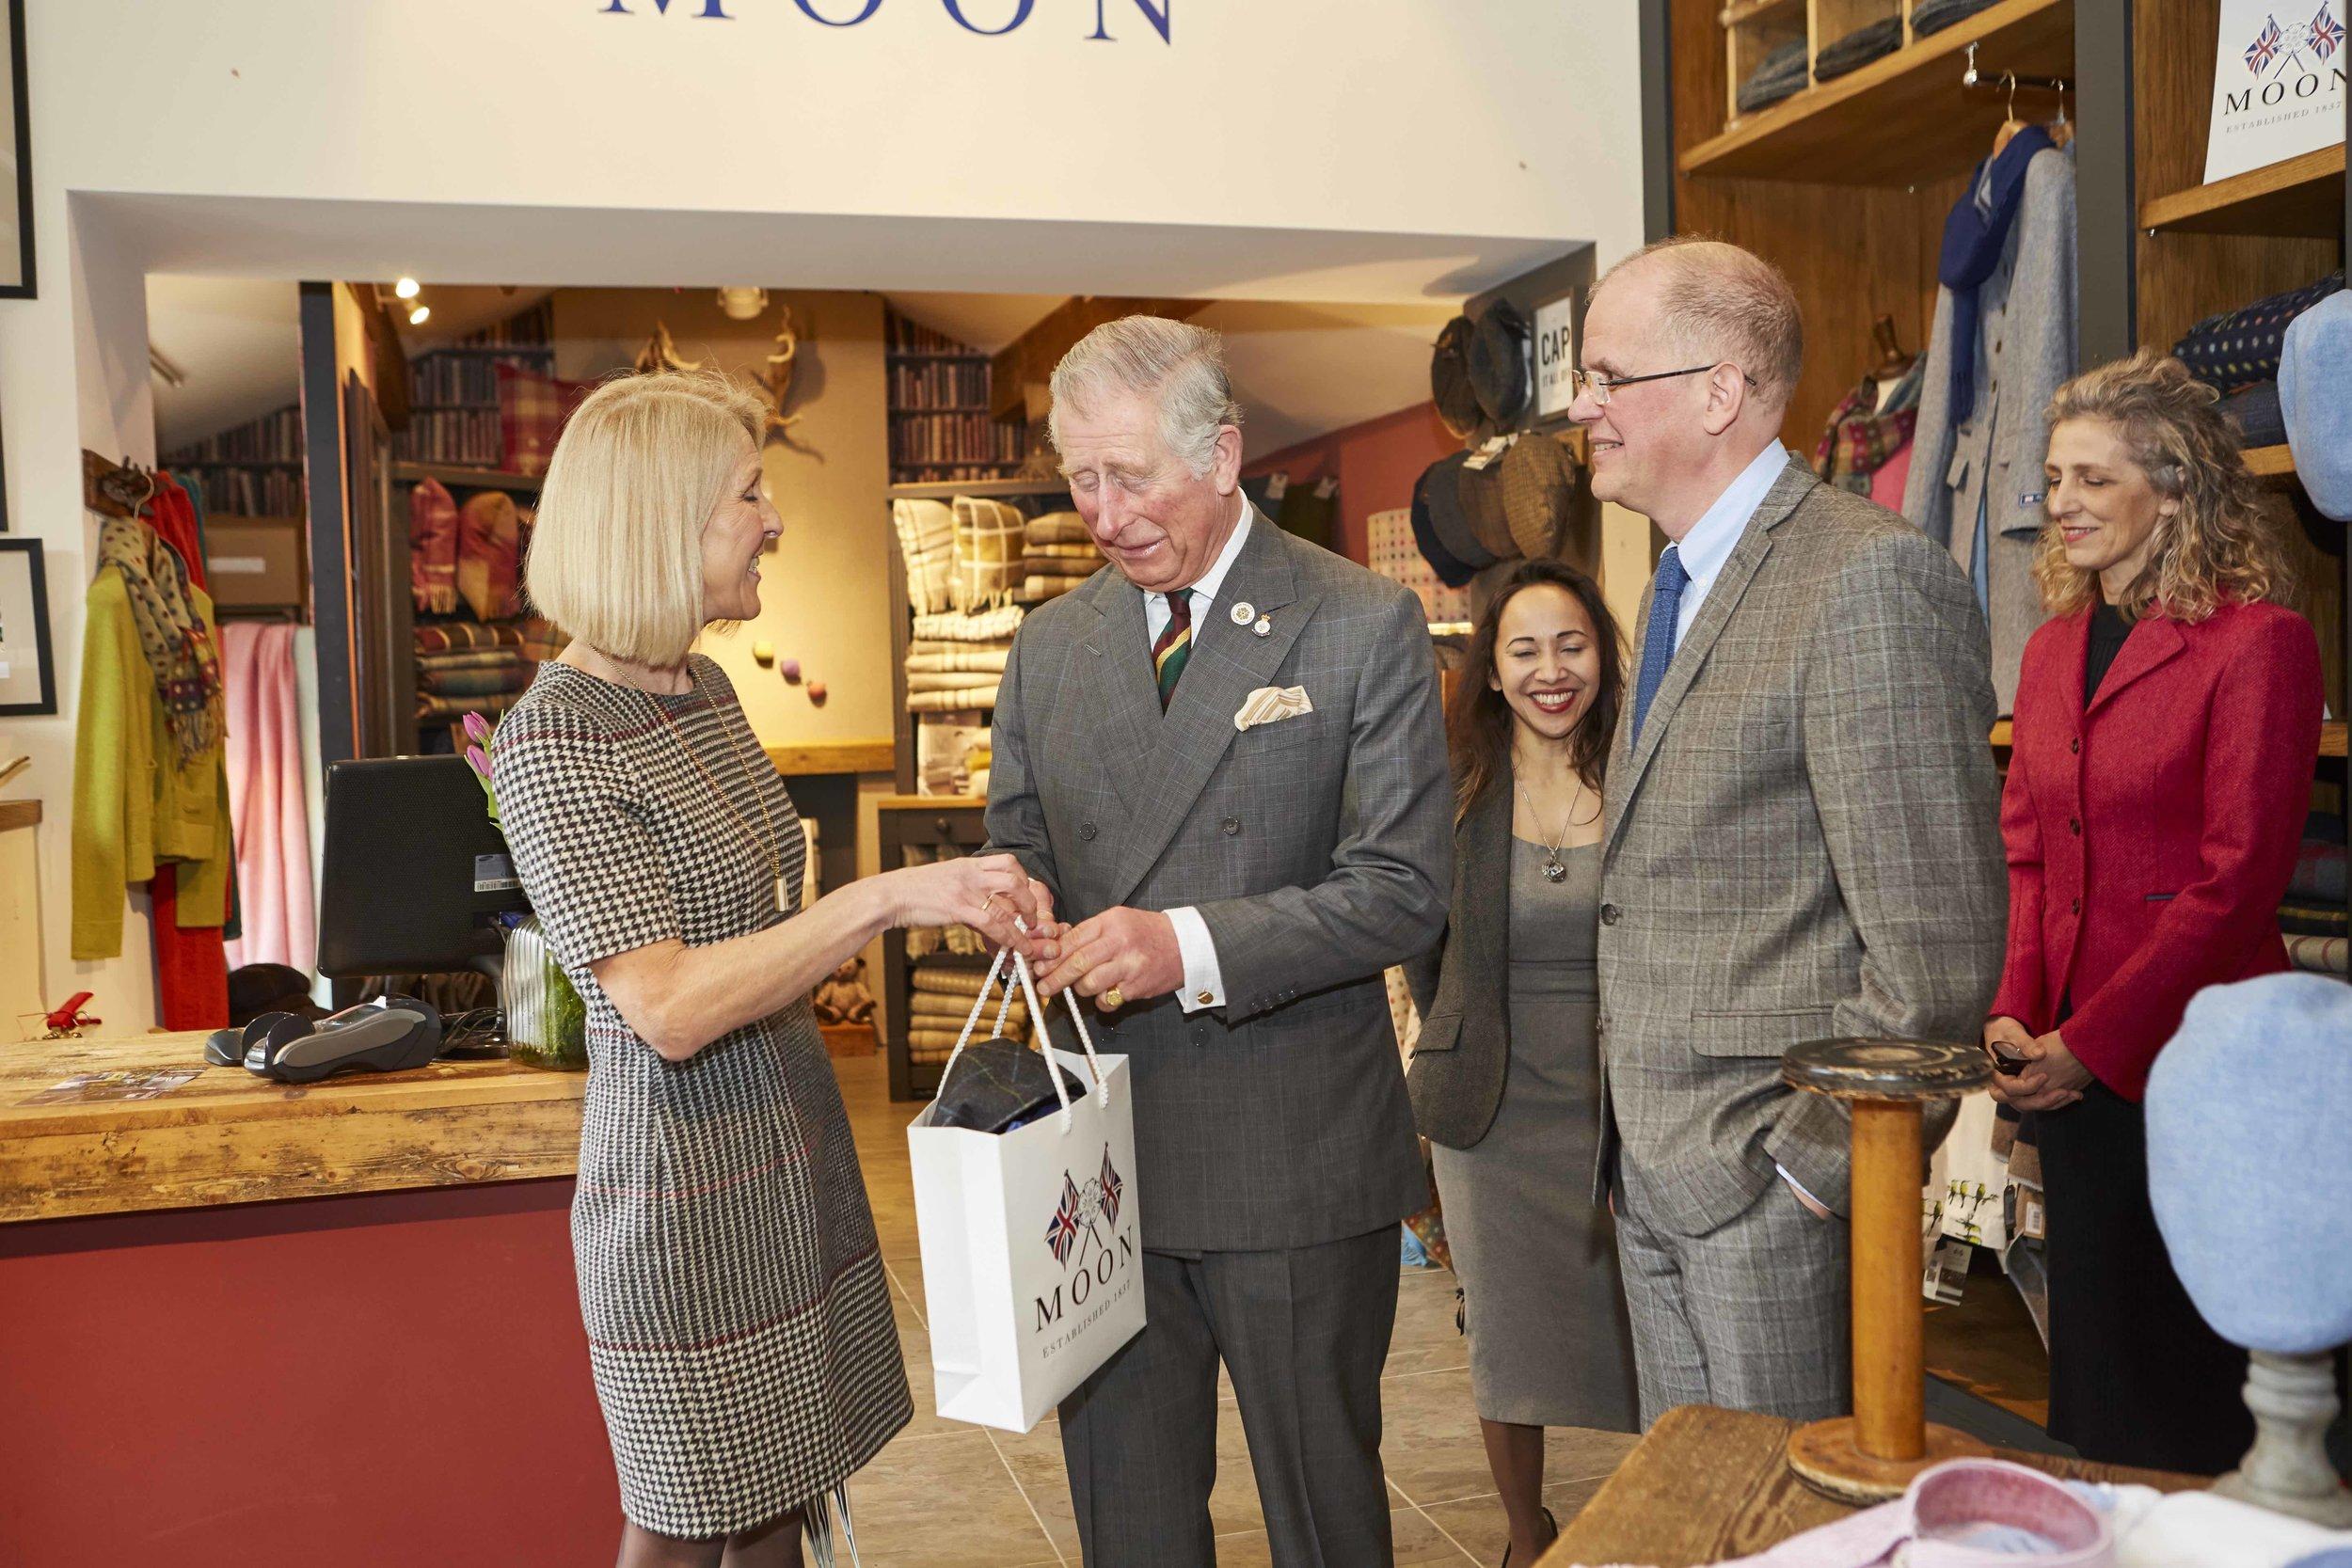 HRH Prince Charles receiving his Kempadoo Grey/Turq check tweed cap.